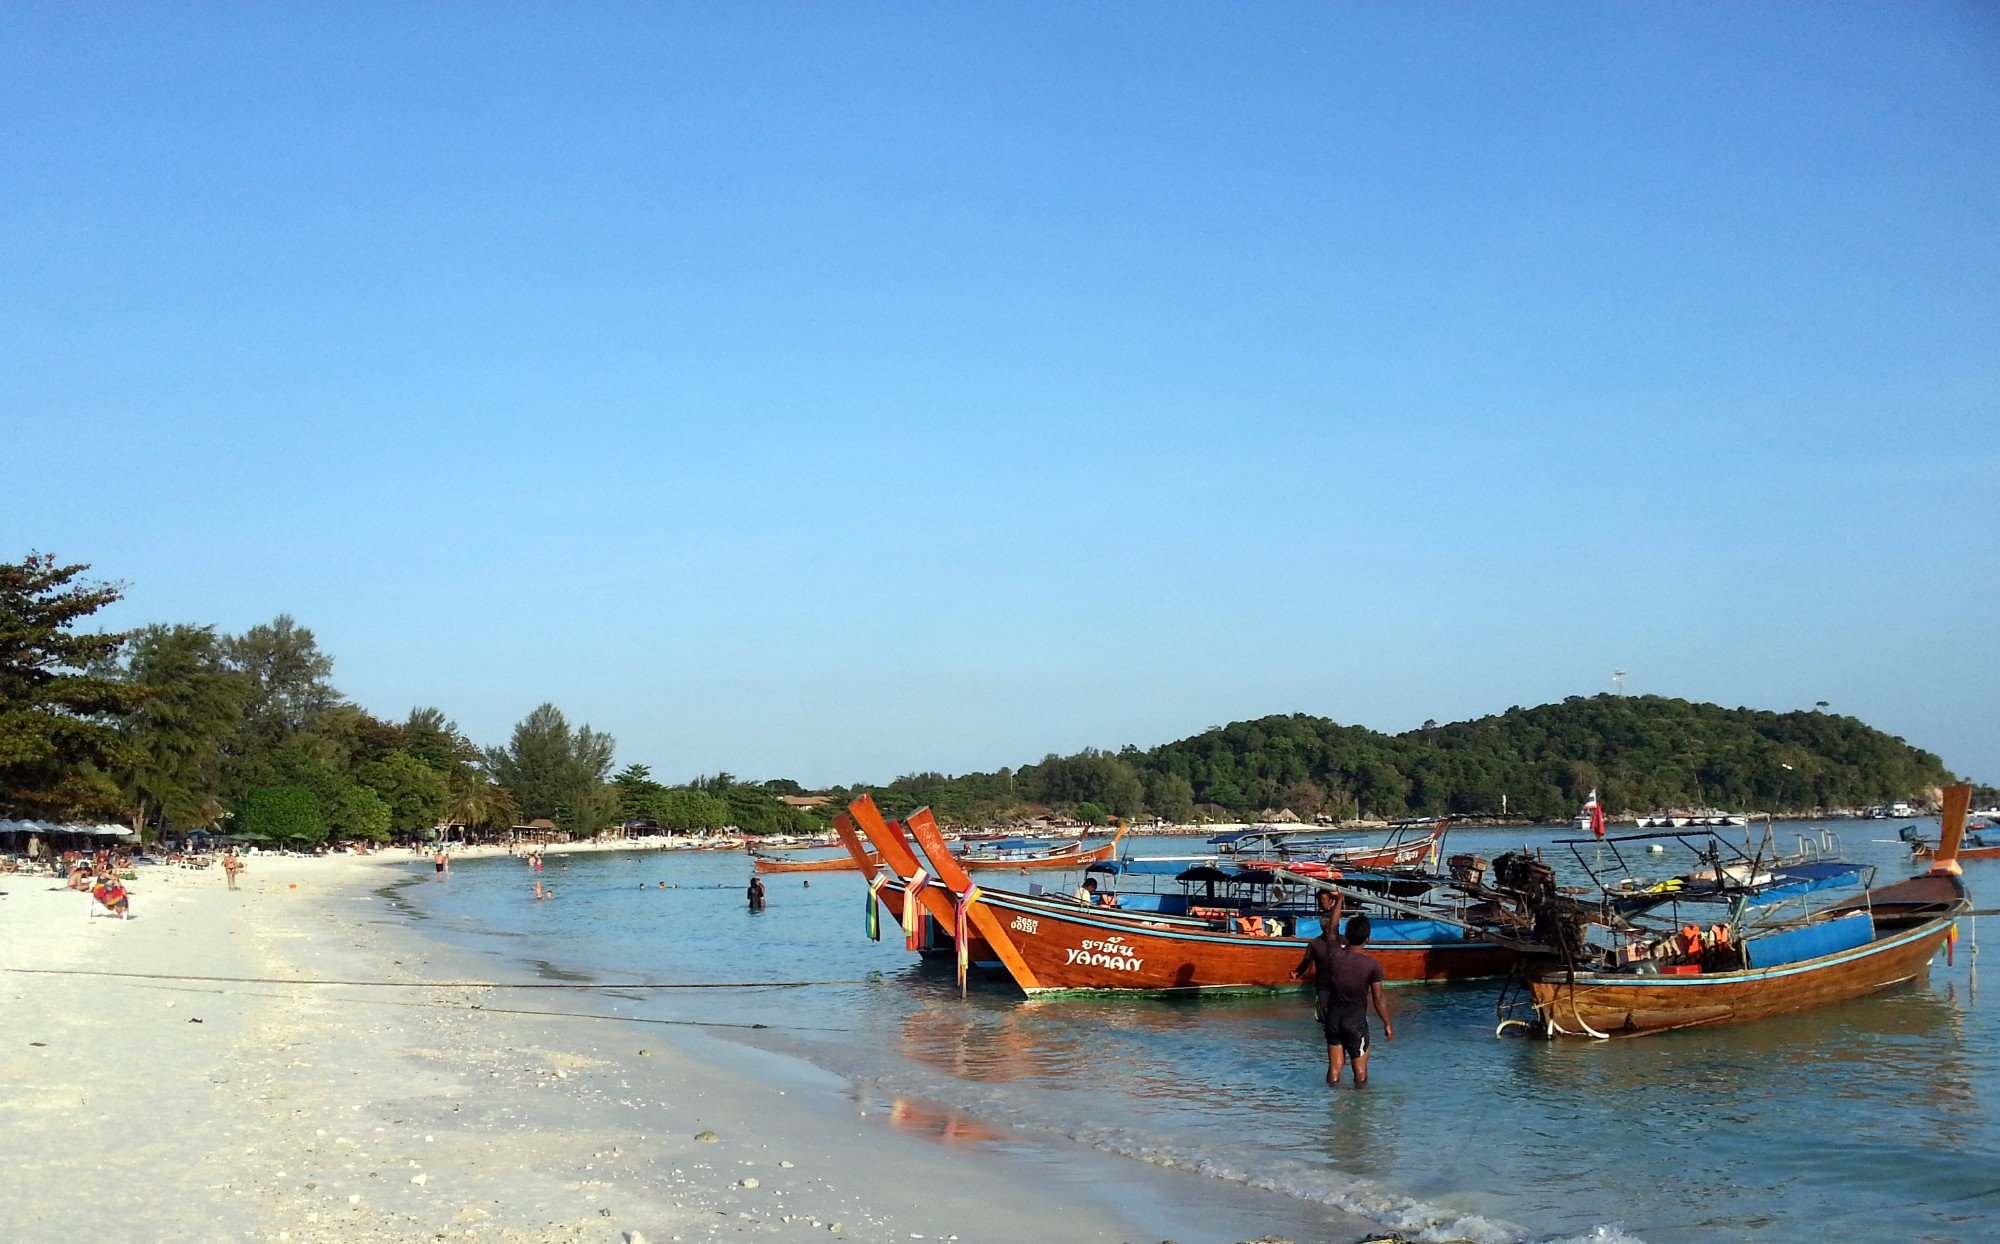 Late afternoon on Pattaya Beach